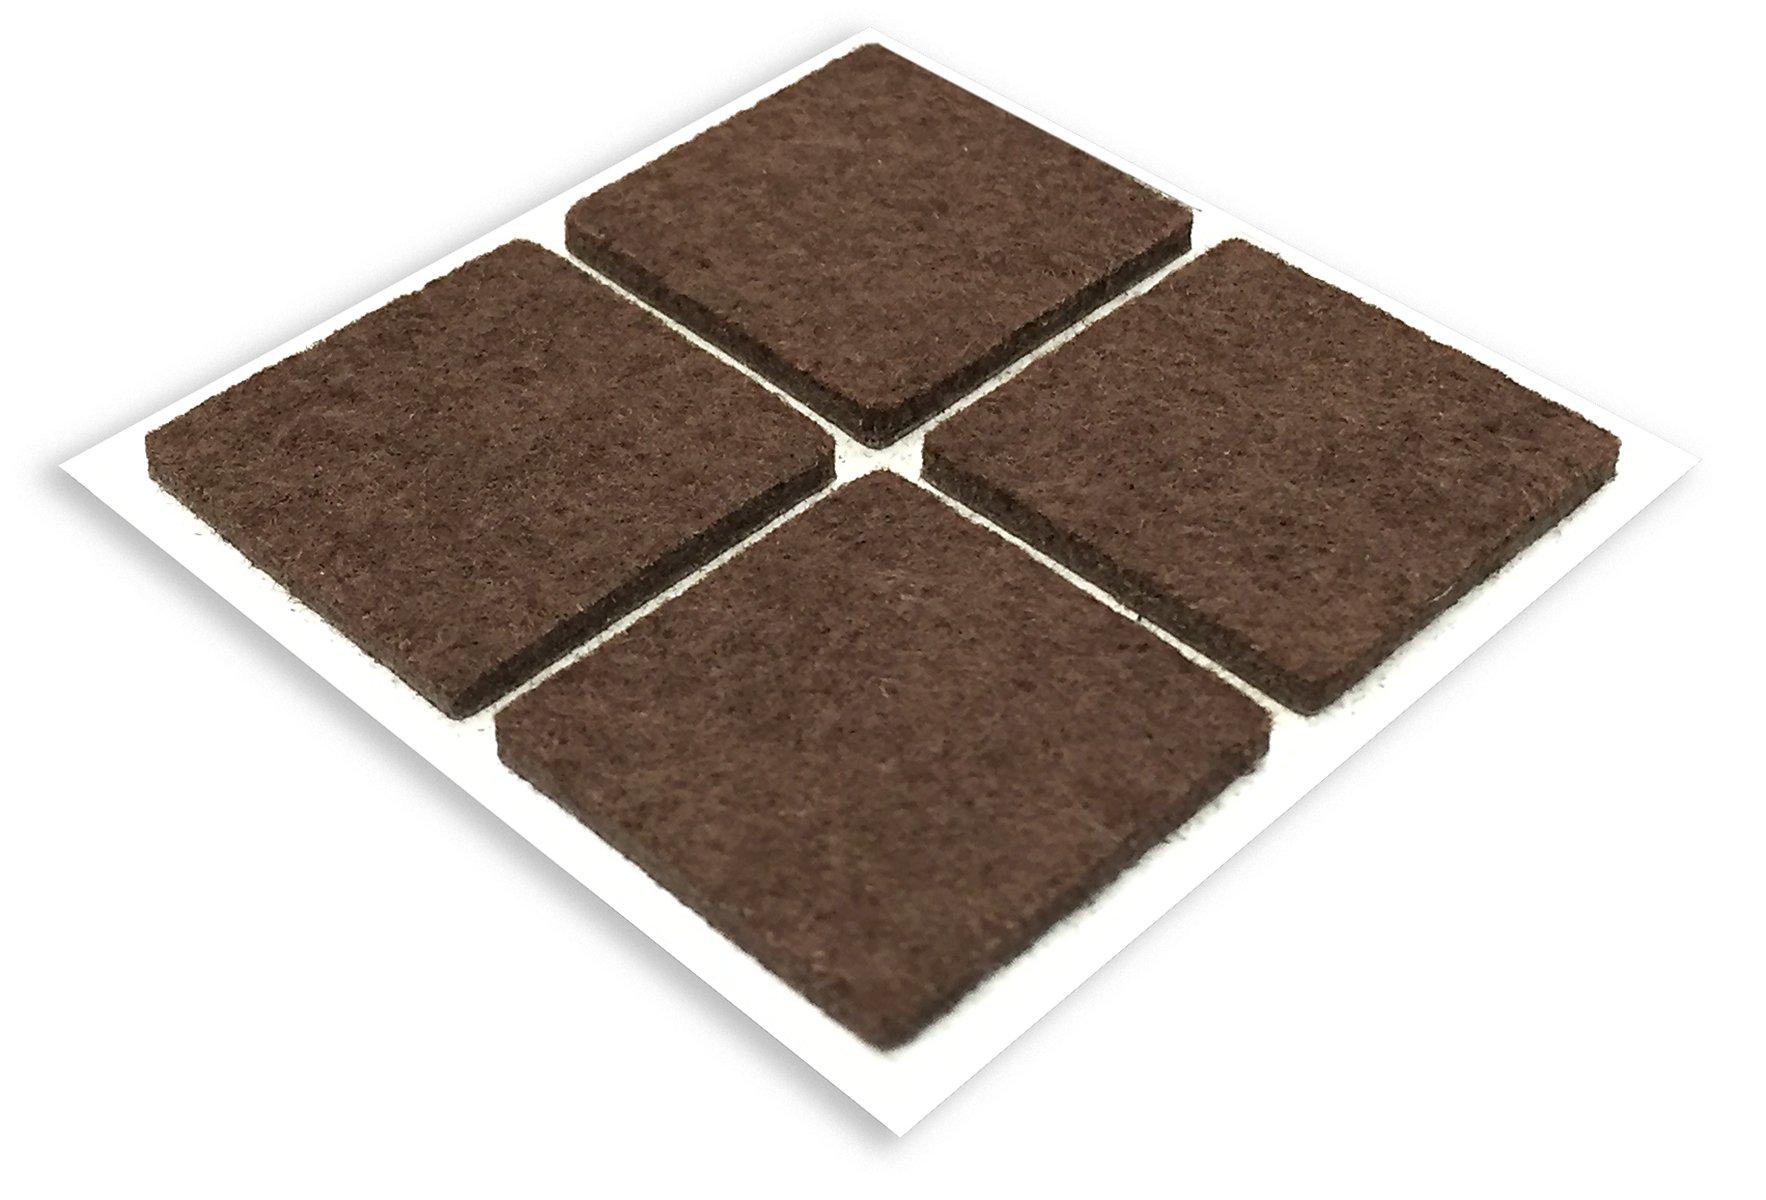 Shepherd Hardware 9823 1-Inch Square Self-Adhesive Felt Furniture Pads, 4-Pack, Brown